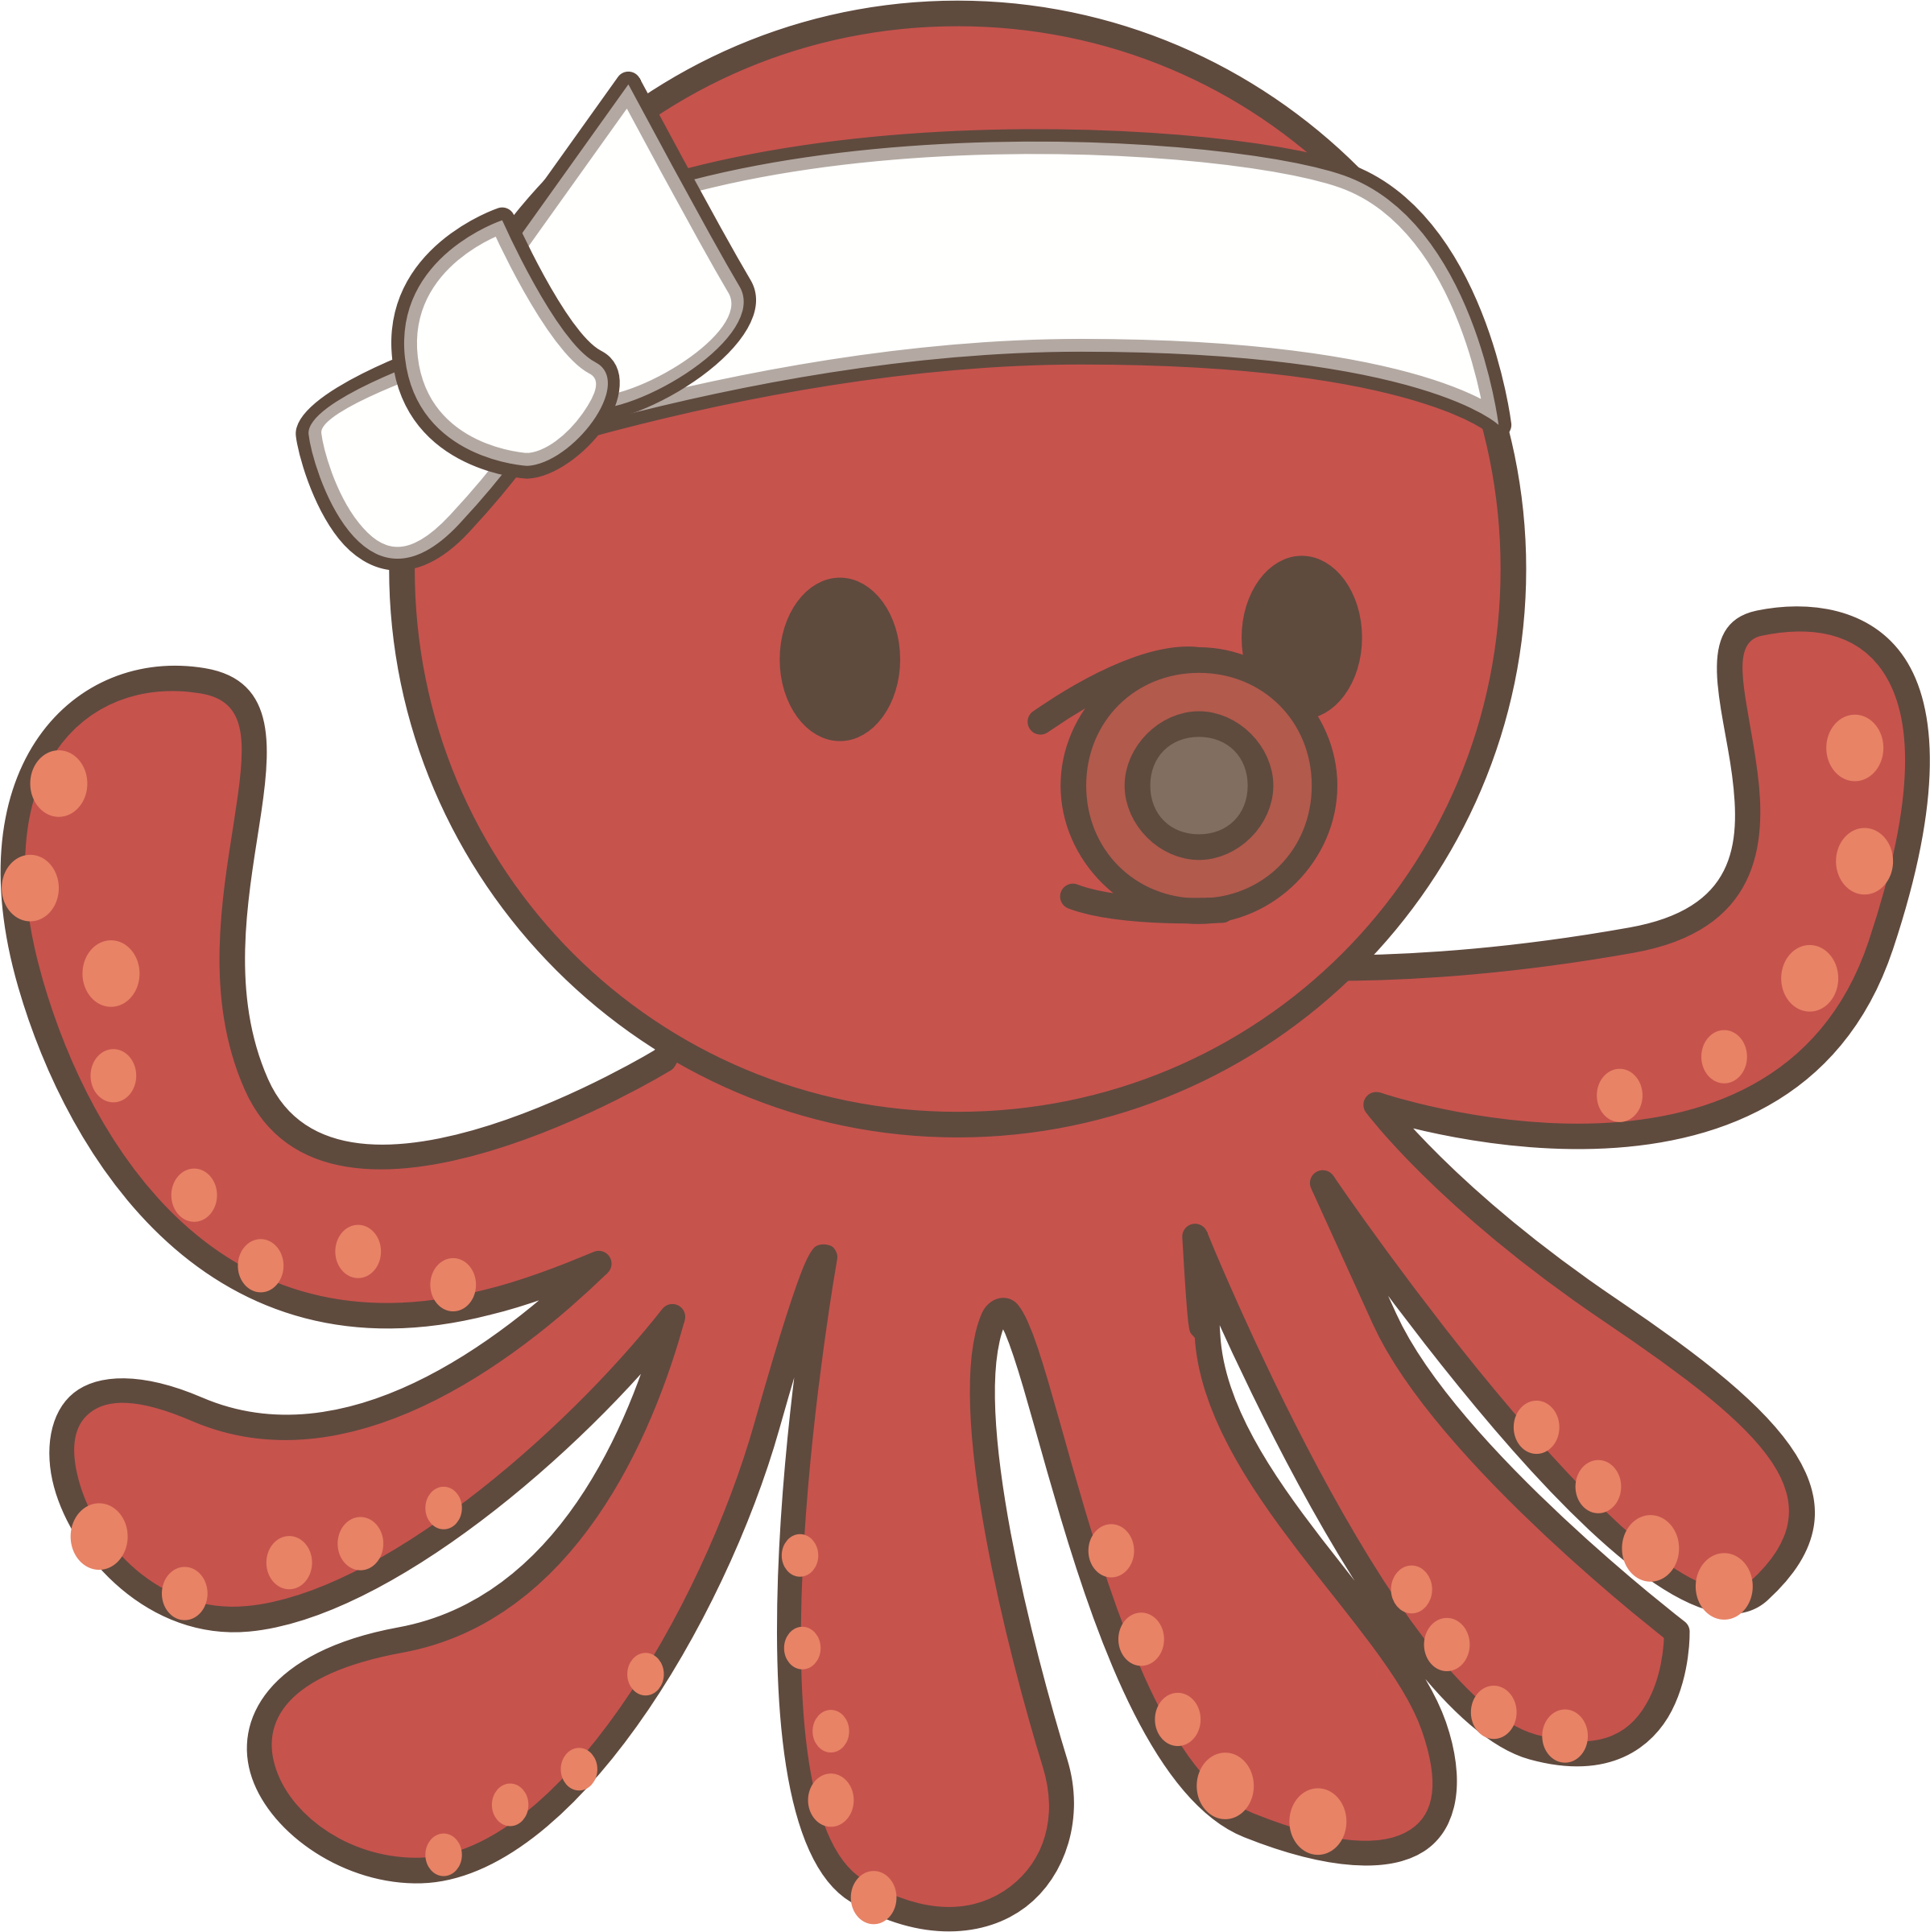 Clipart octopus pdf. Png